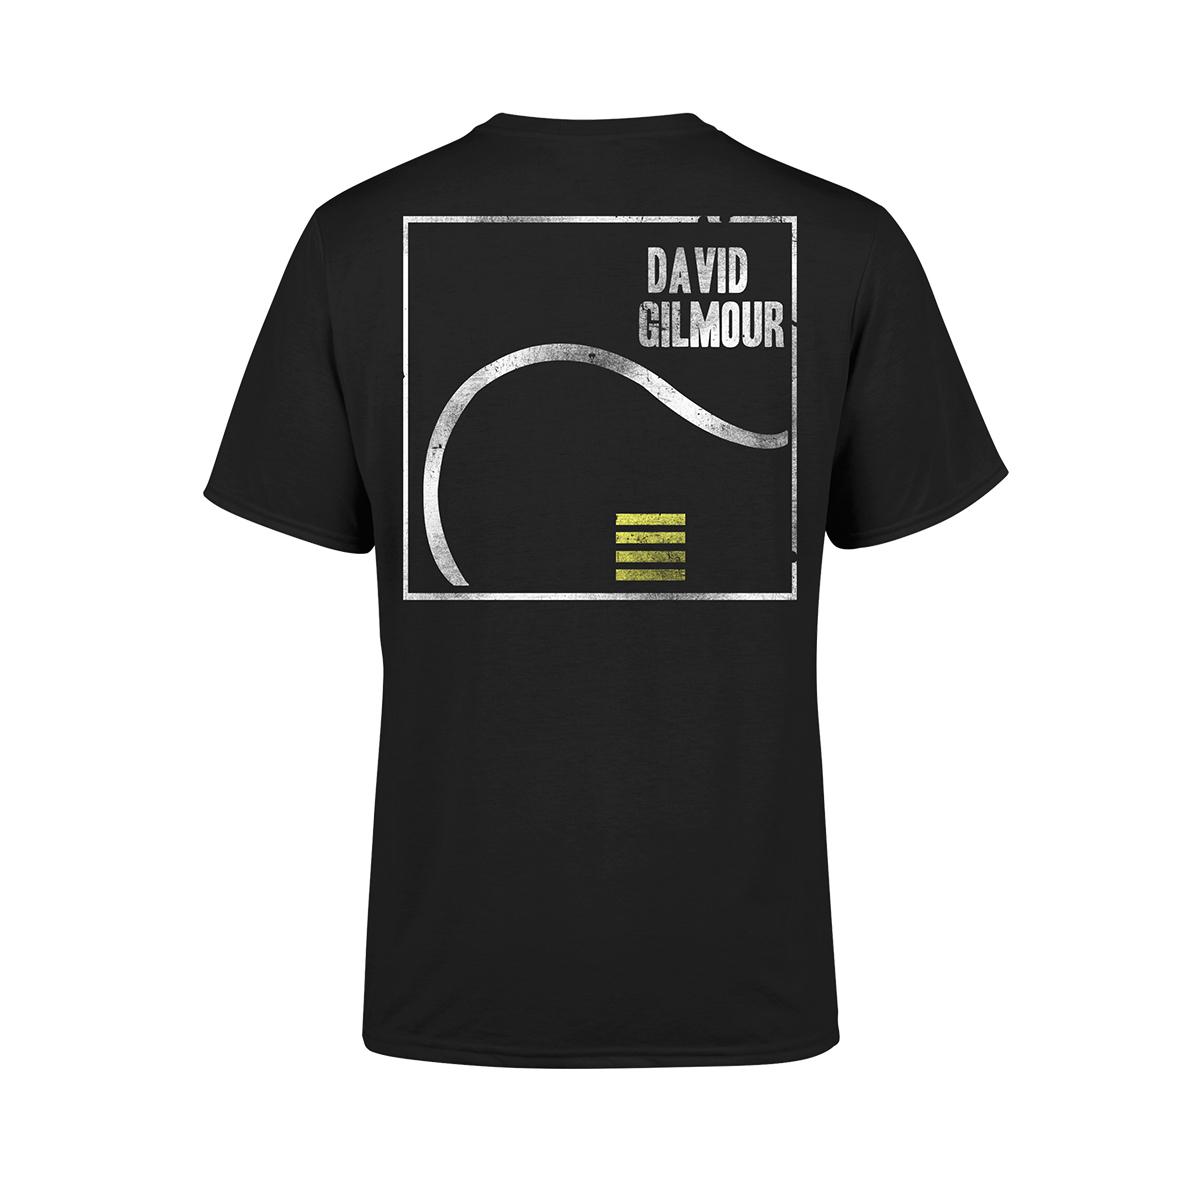 David Gilmour Silhouette T-shirt